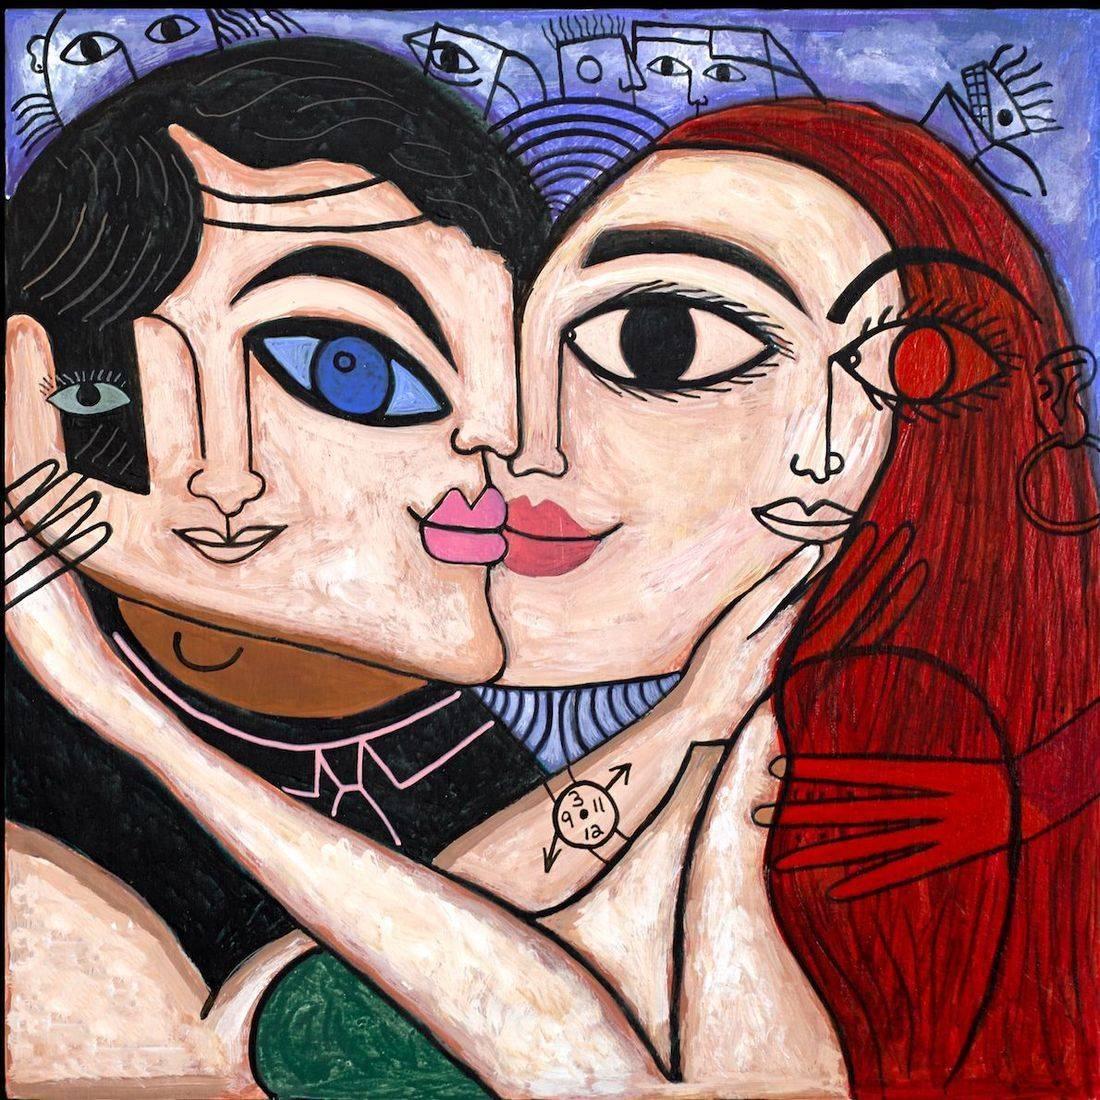 Kiss, Love, Romance, Passion